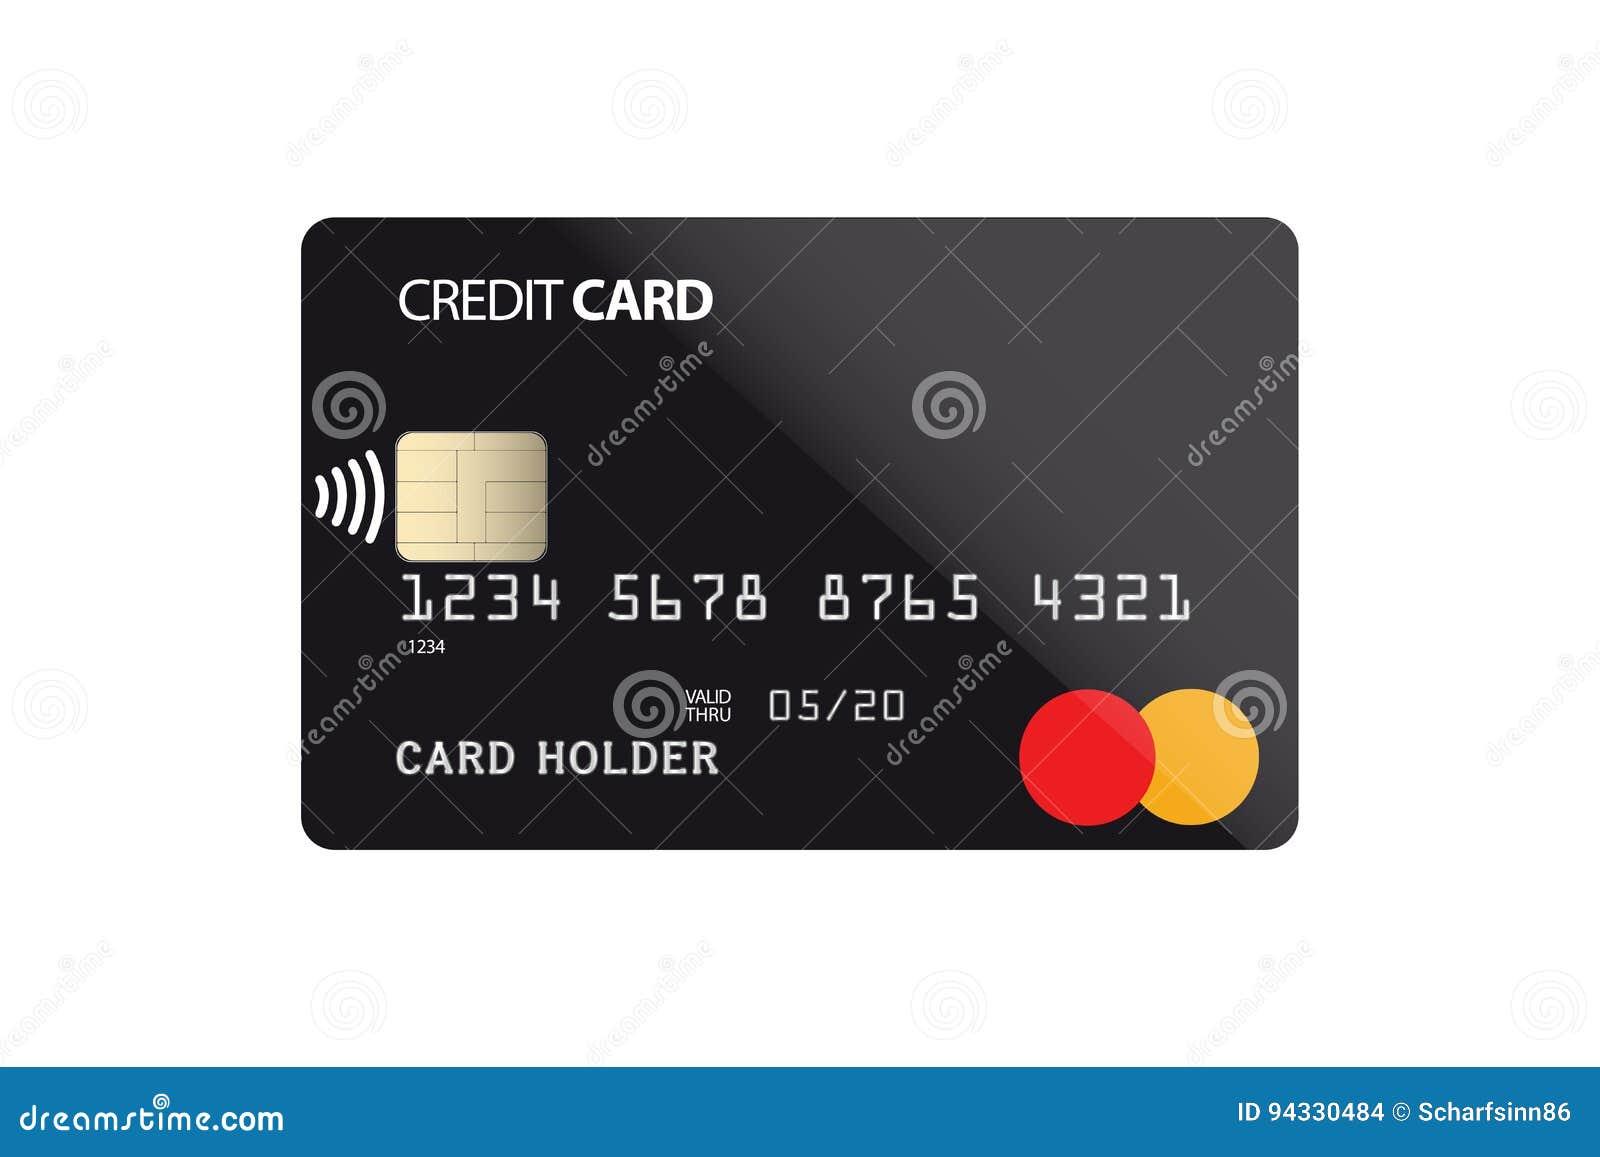 Plastikkreditkarte mit NFC-Chip